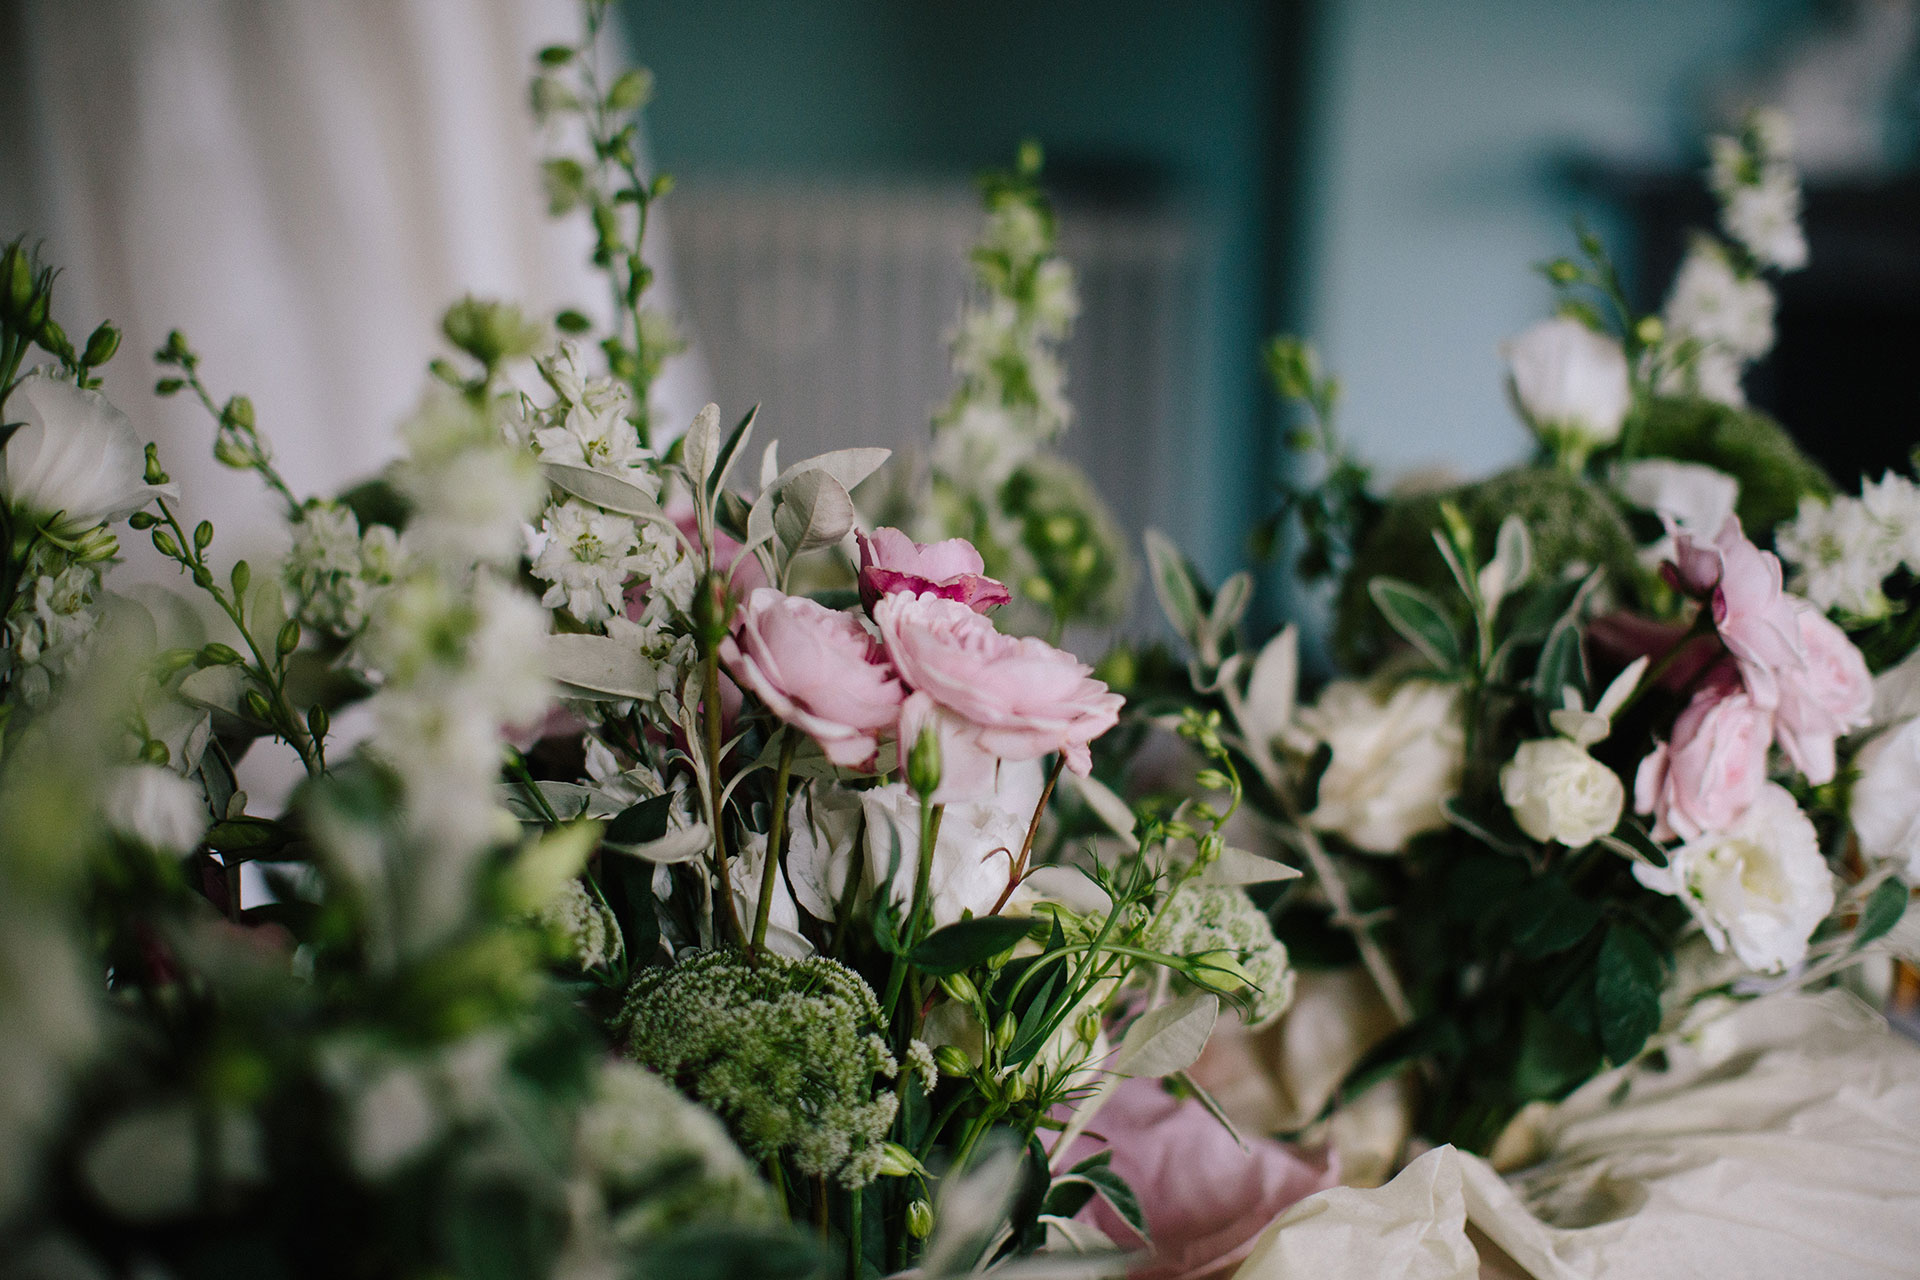 Langar-Hall-wedding-photographer-in-Nottinghamshire-Michael-Newington-Gray-9.jpg